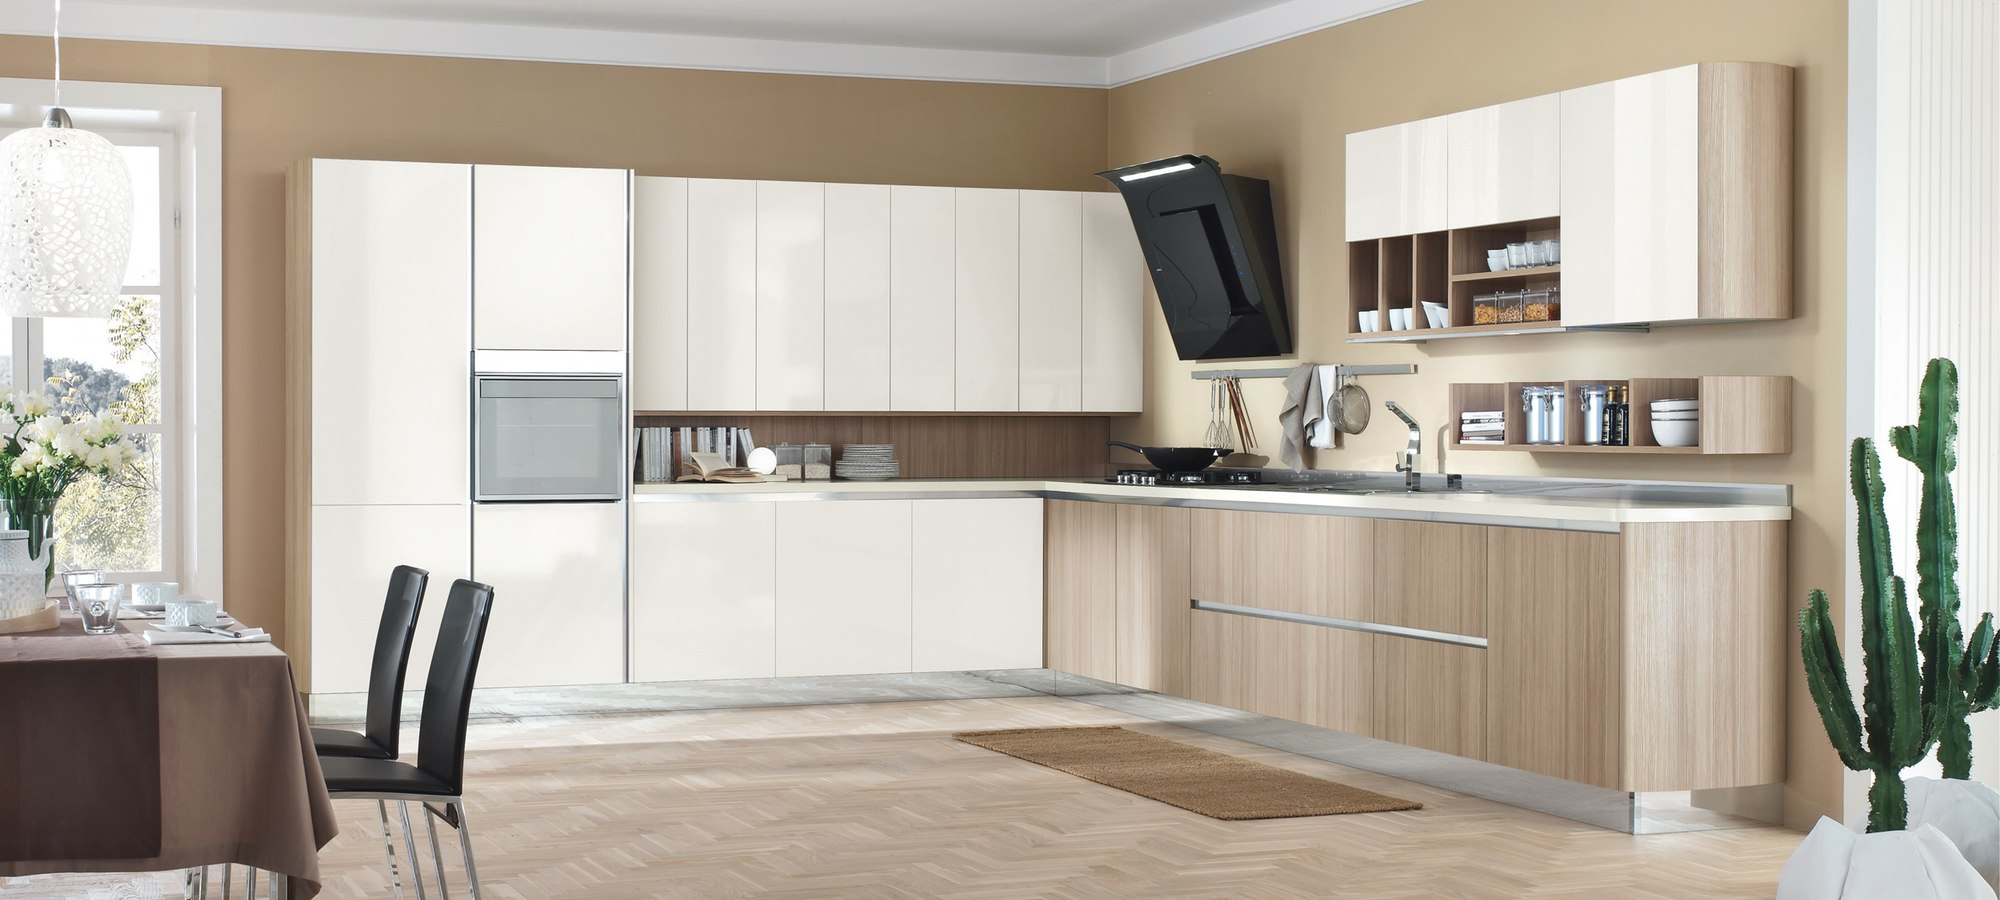 nos cuisines avant apr s design conception. Black Bedroom Furniture Sets. Home Design Ideas